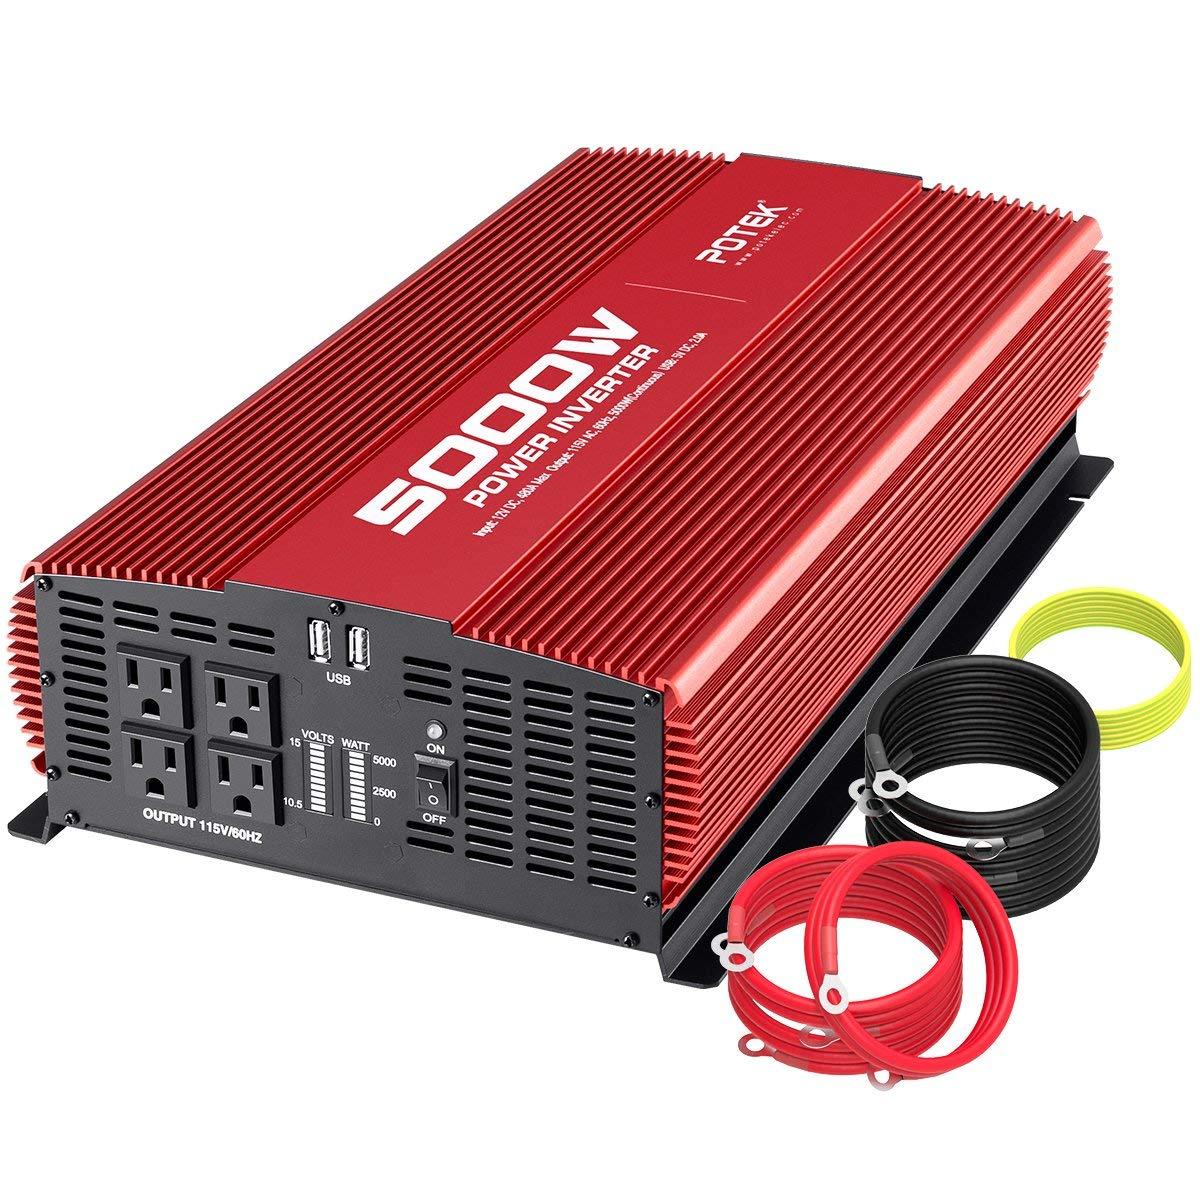 hight resolution of get quotations potek 5000w power inverter dc 12v to ac 110v car inverter 4 ac outlets with 2